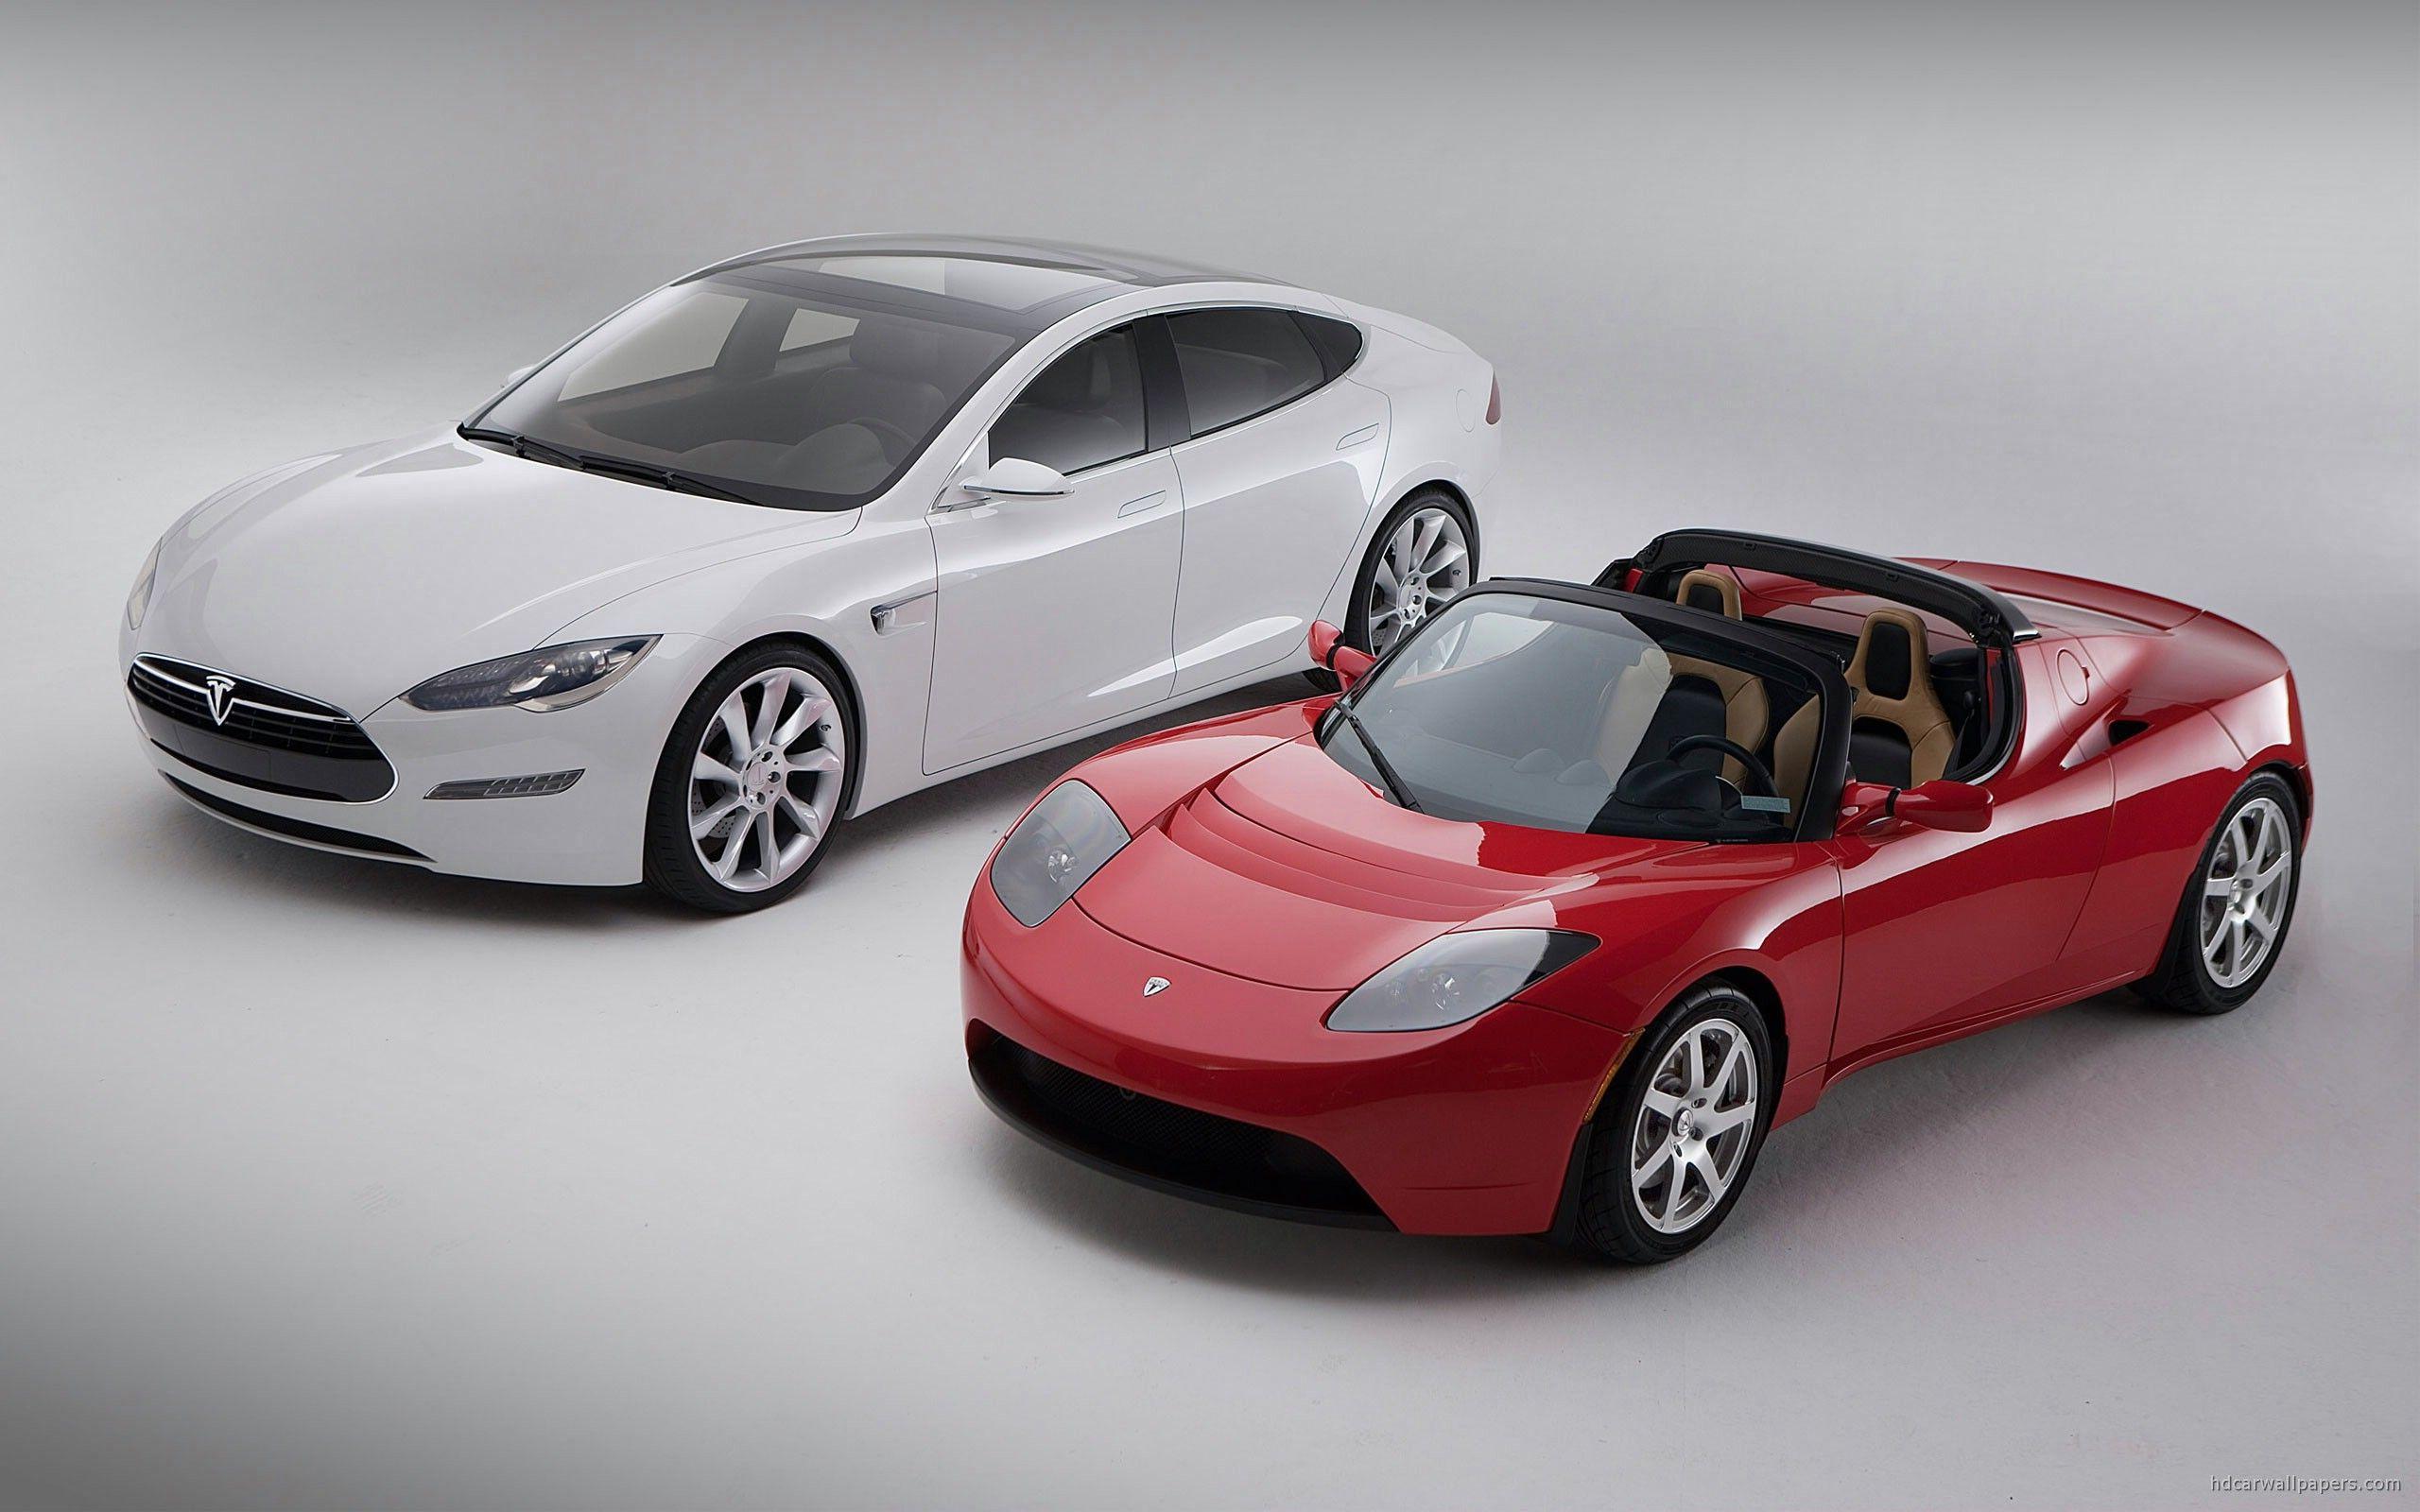 Amazing Tesla Model S Sedan Coupe Free Desktop Background